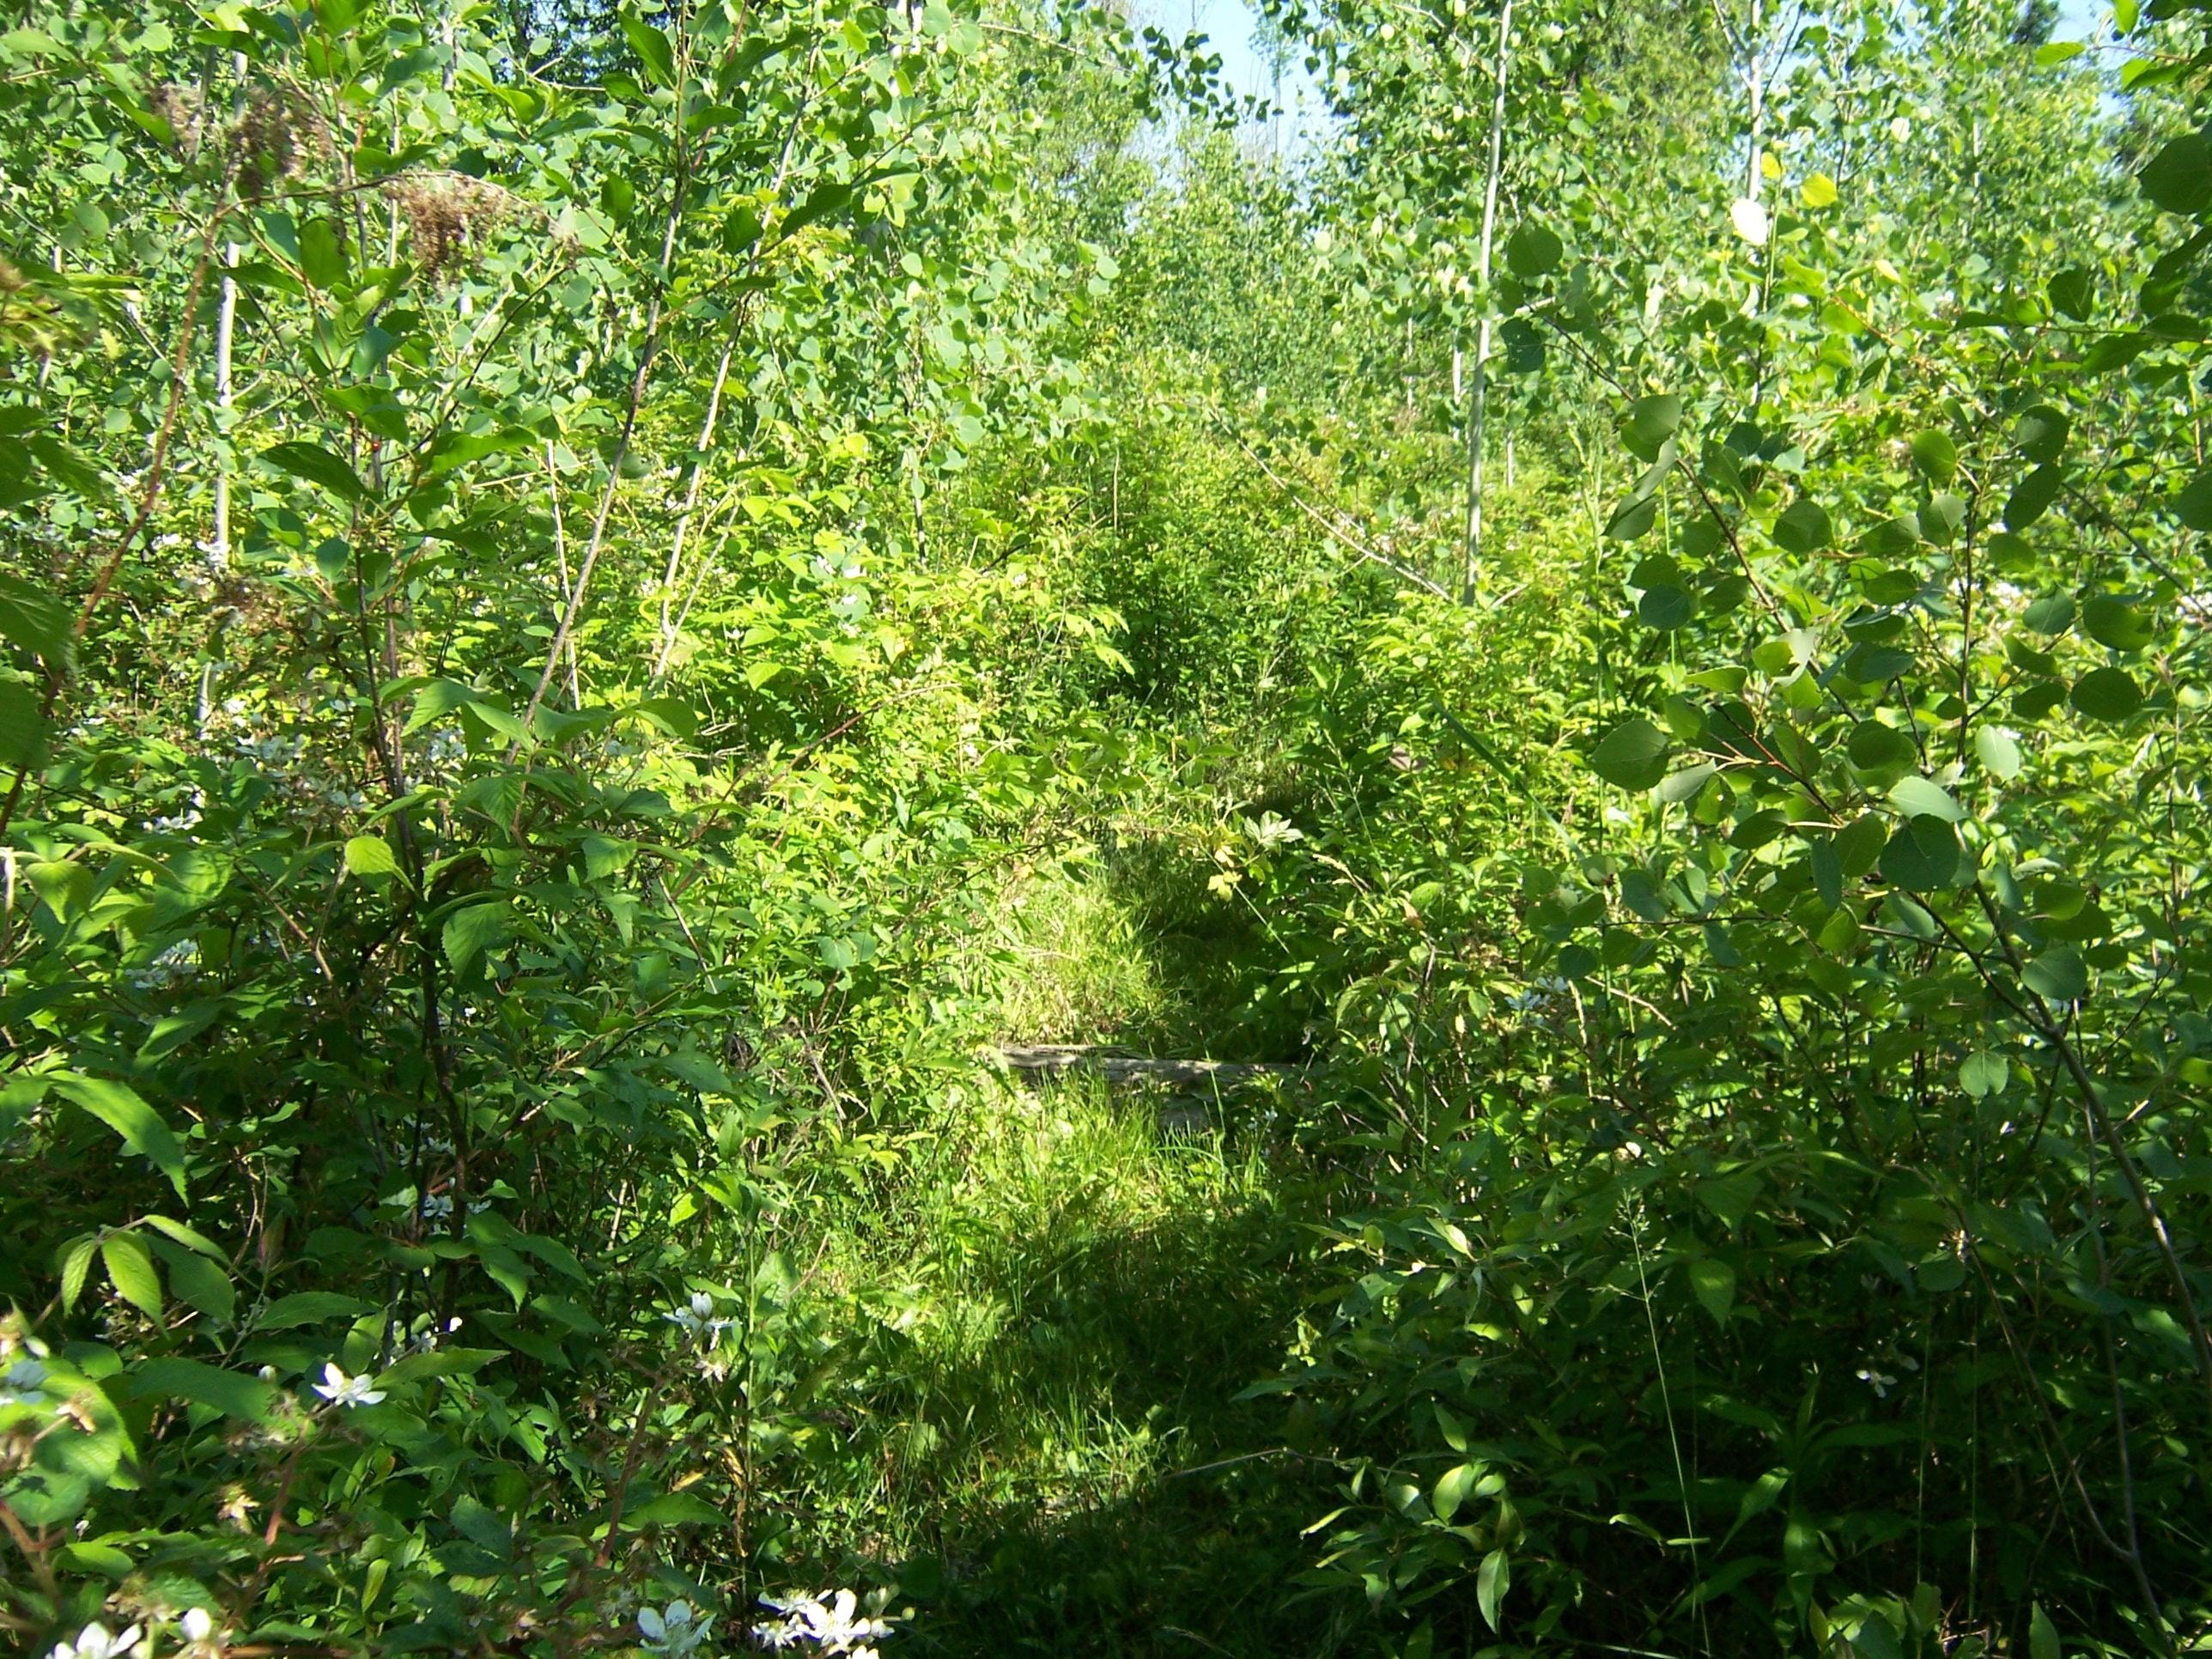 Southline Plot trail 6-10 (2)